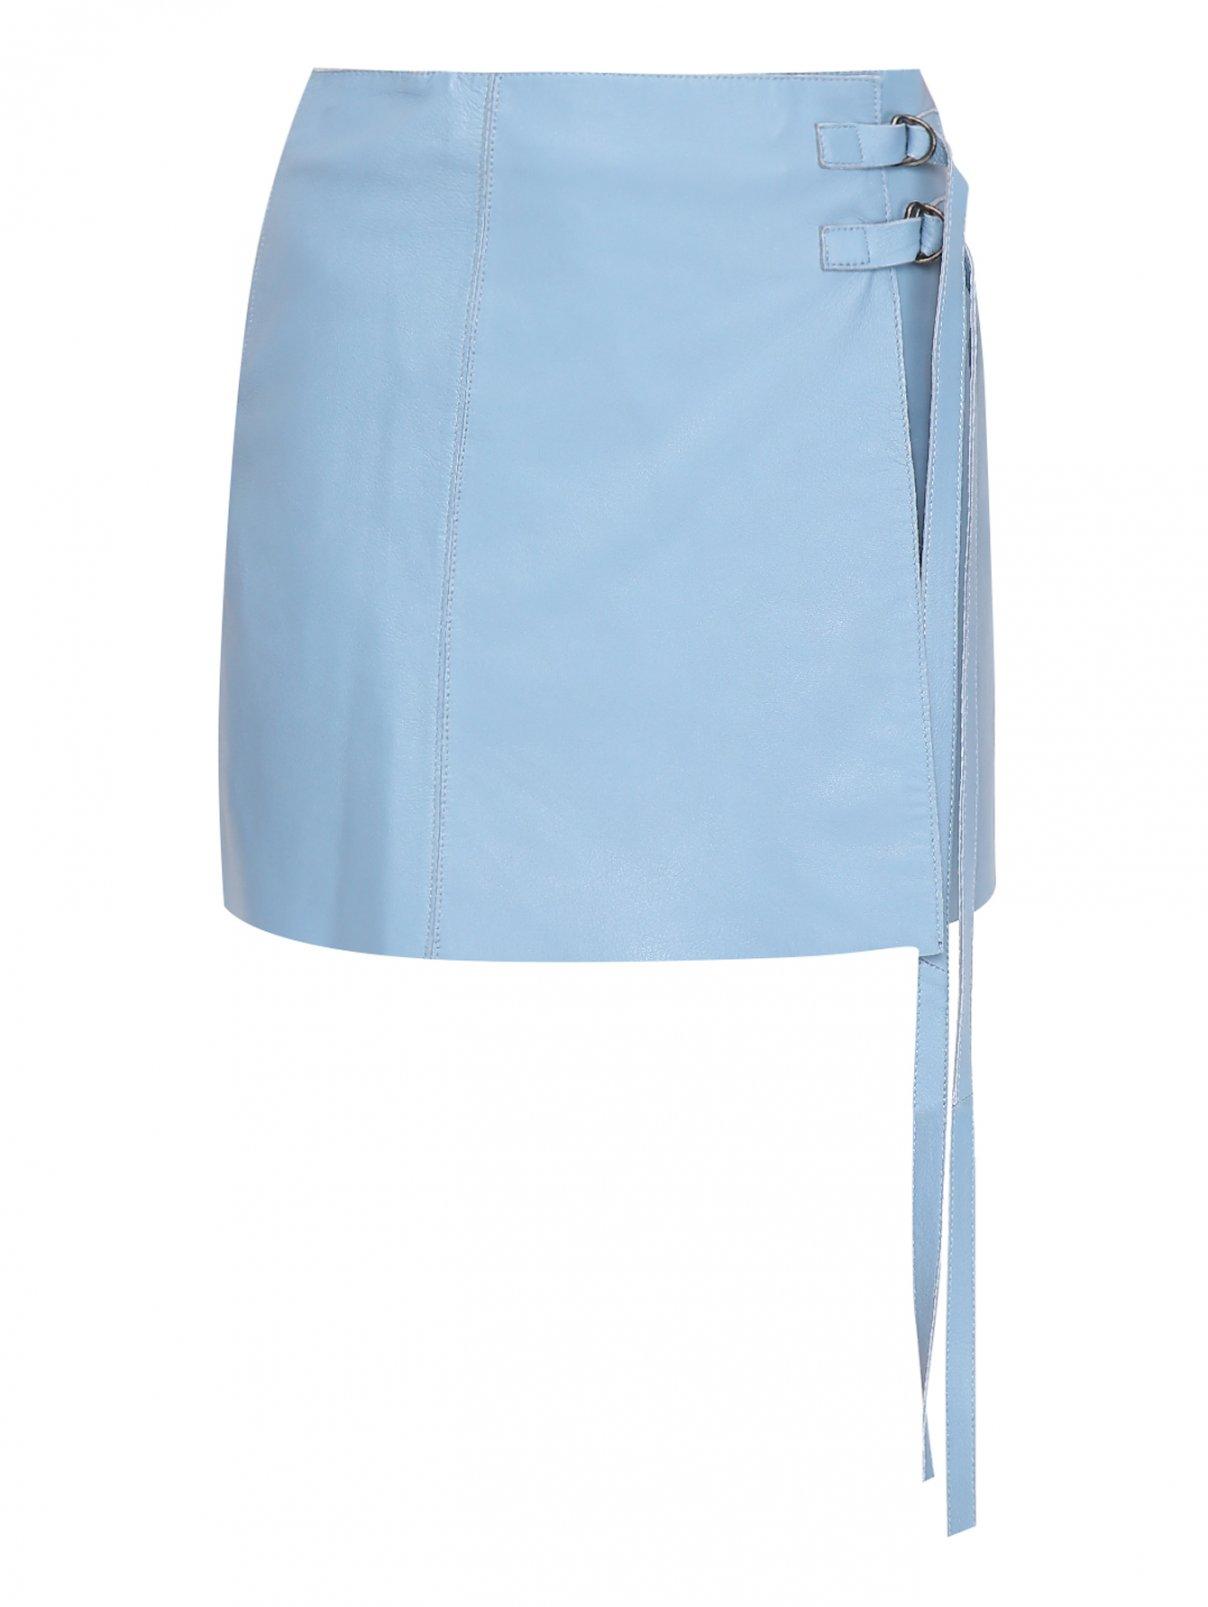 Юбка-мини, с запахом Alysi  –  Общий вид  – Цвет:  Синий